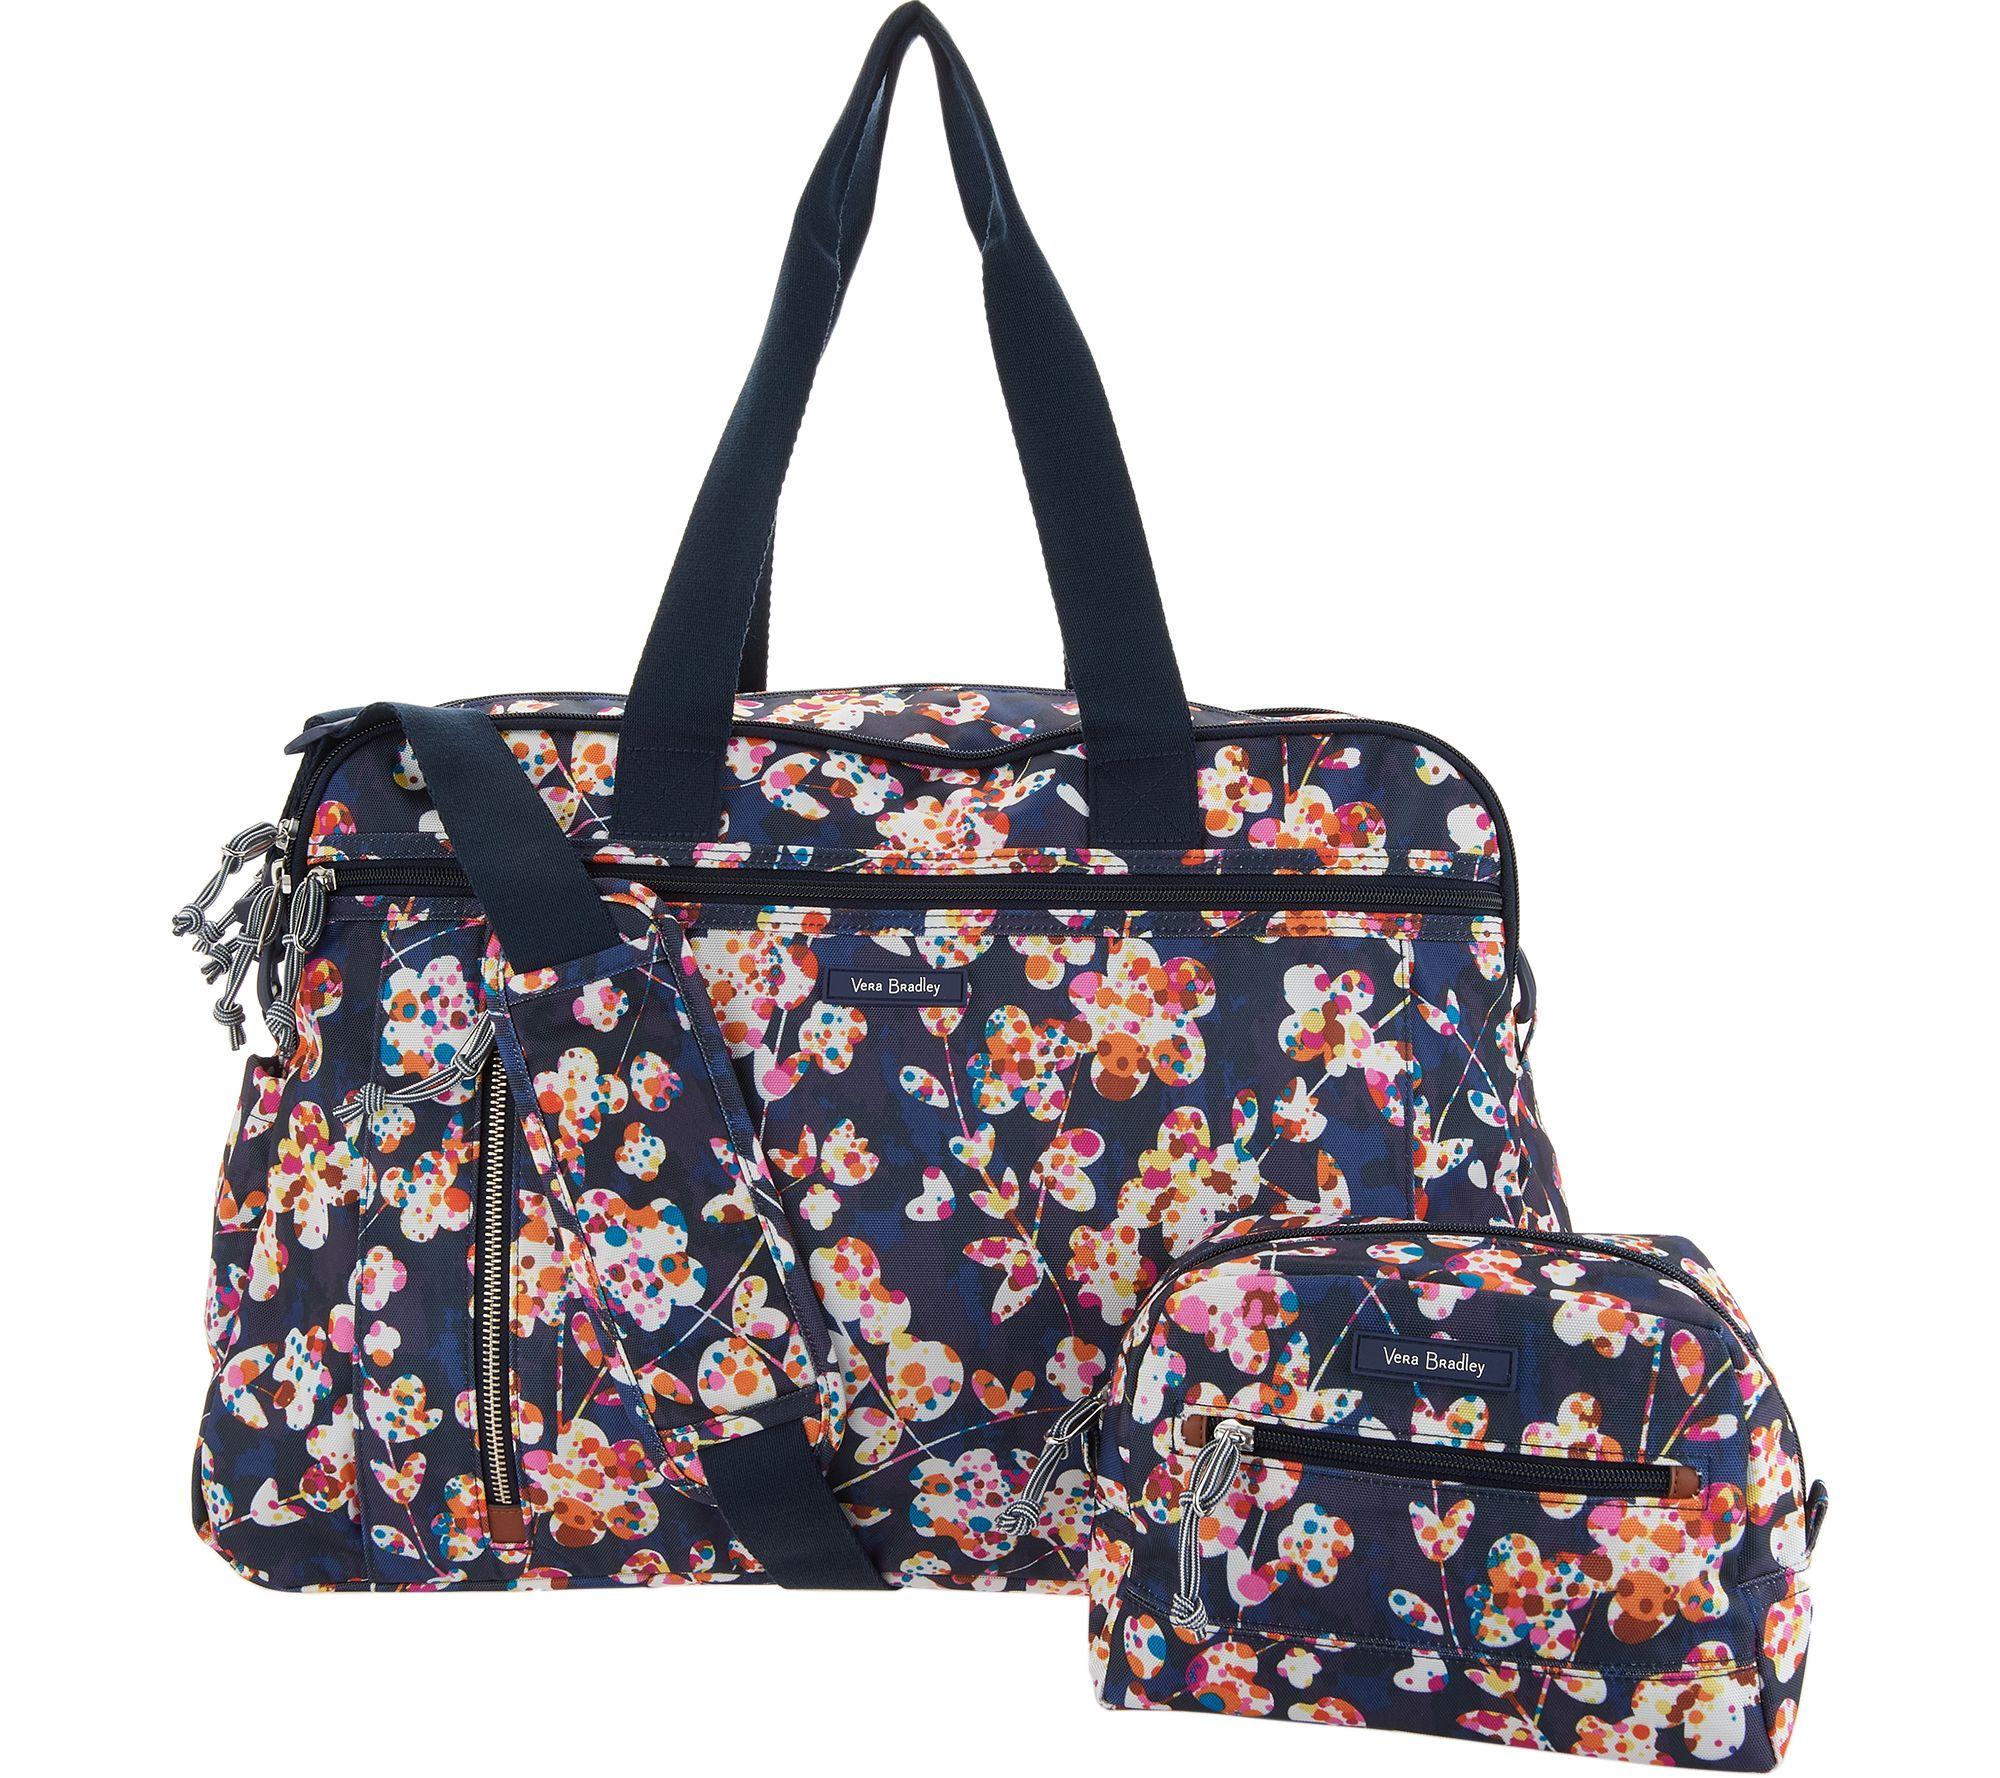 Vera Bradley Lighten Up Weekender Travel Bag W Cosmetic Case Qvc